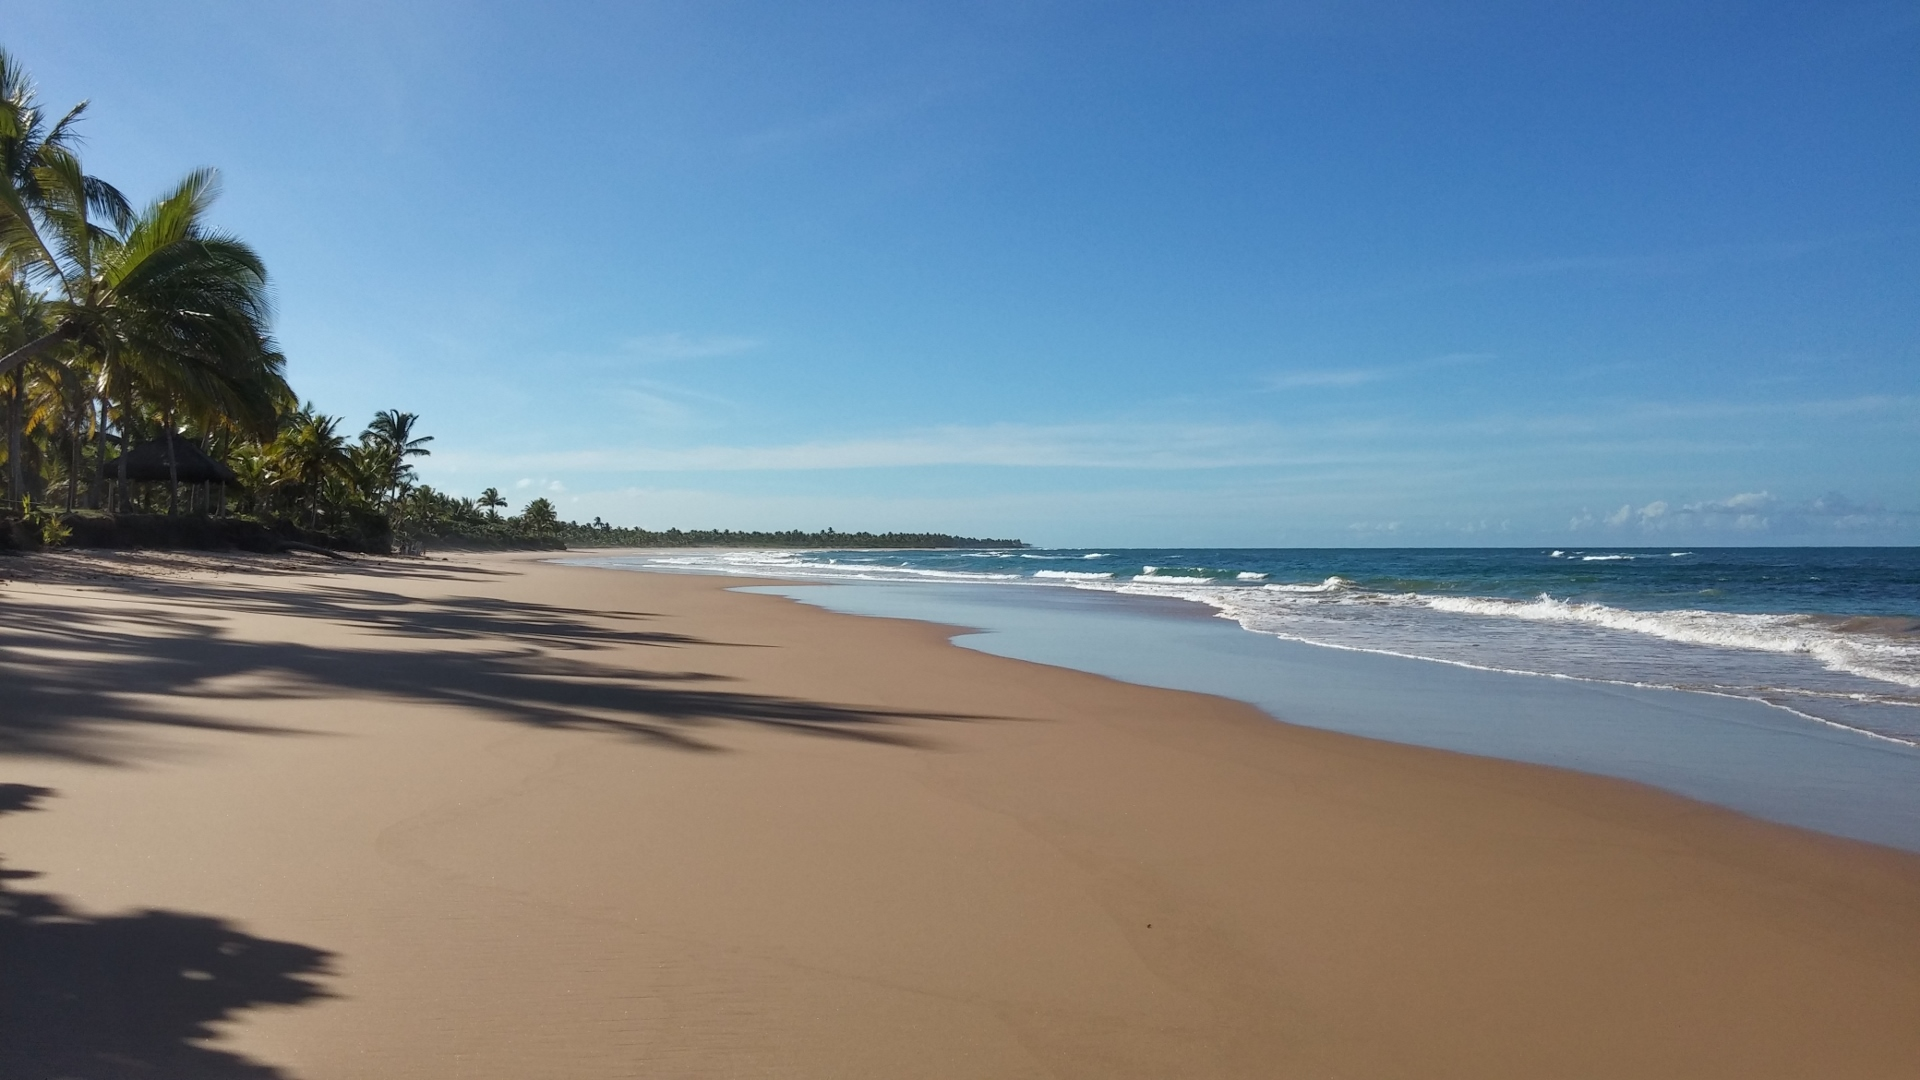 Praia de Algodões, Península de Maraú - BA, by Luciana de Paula, 2016